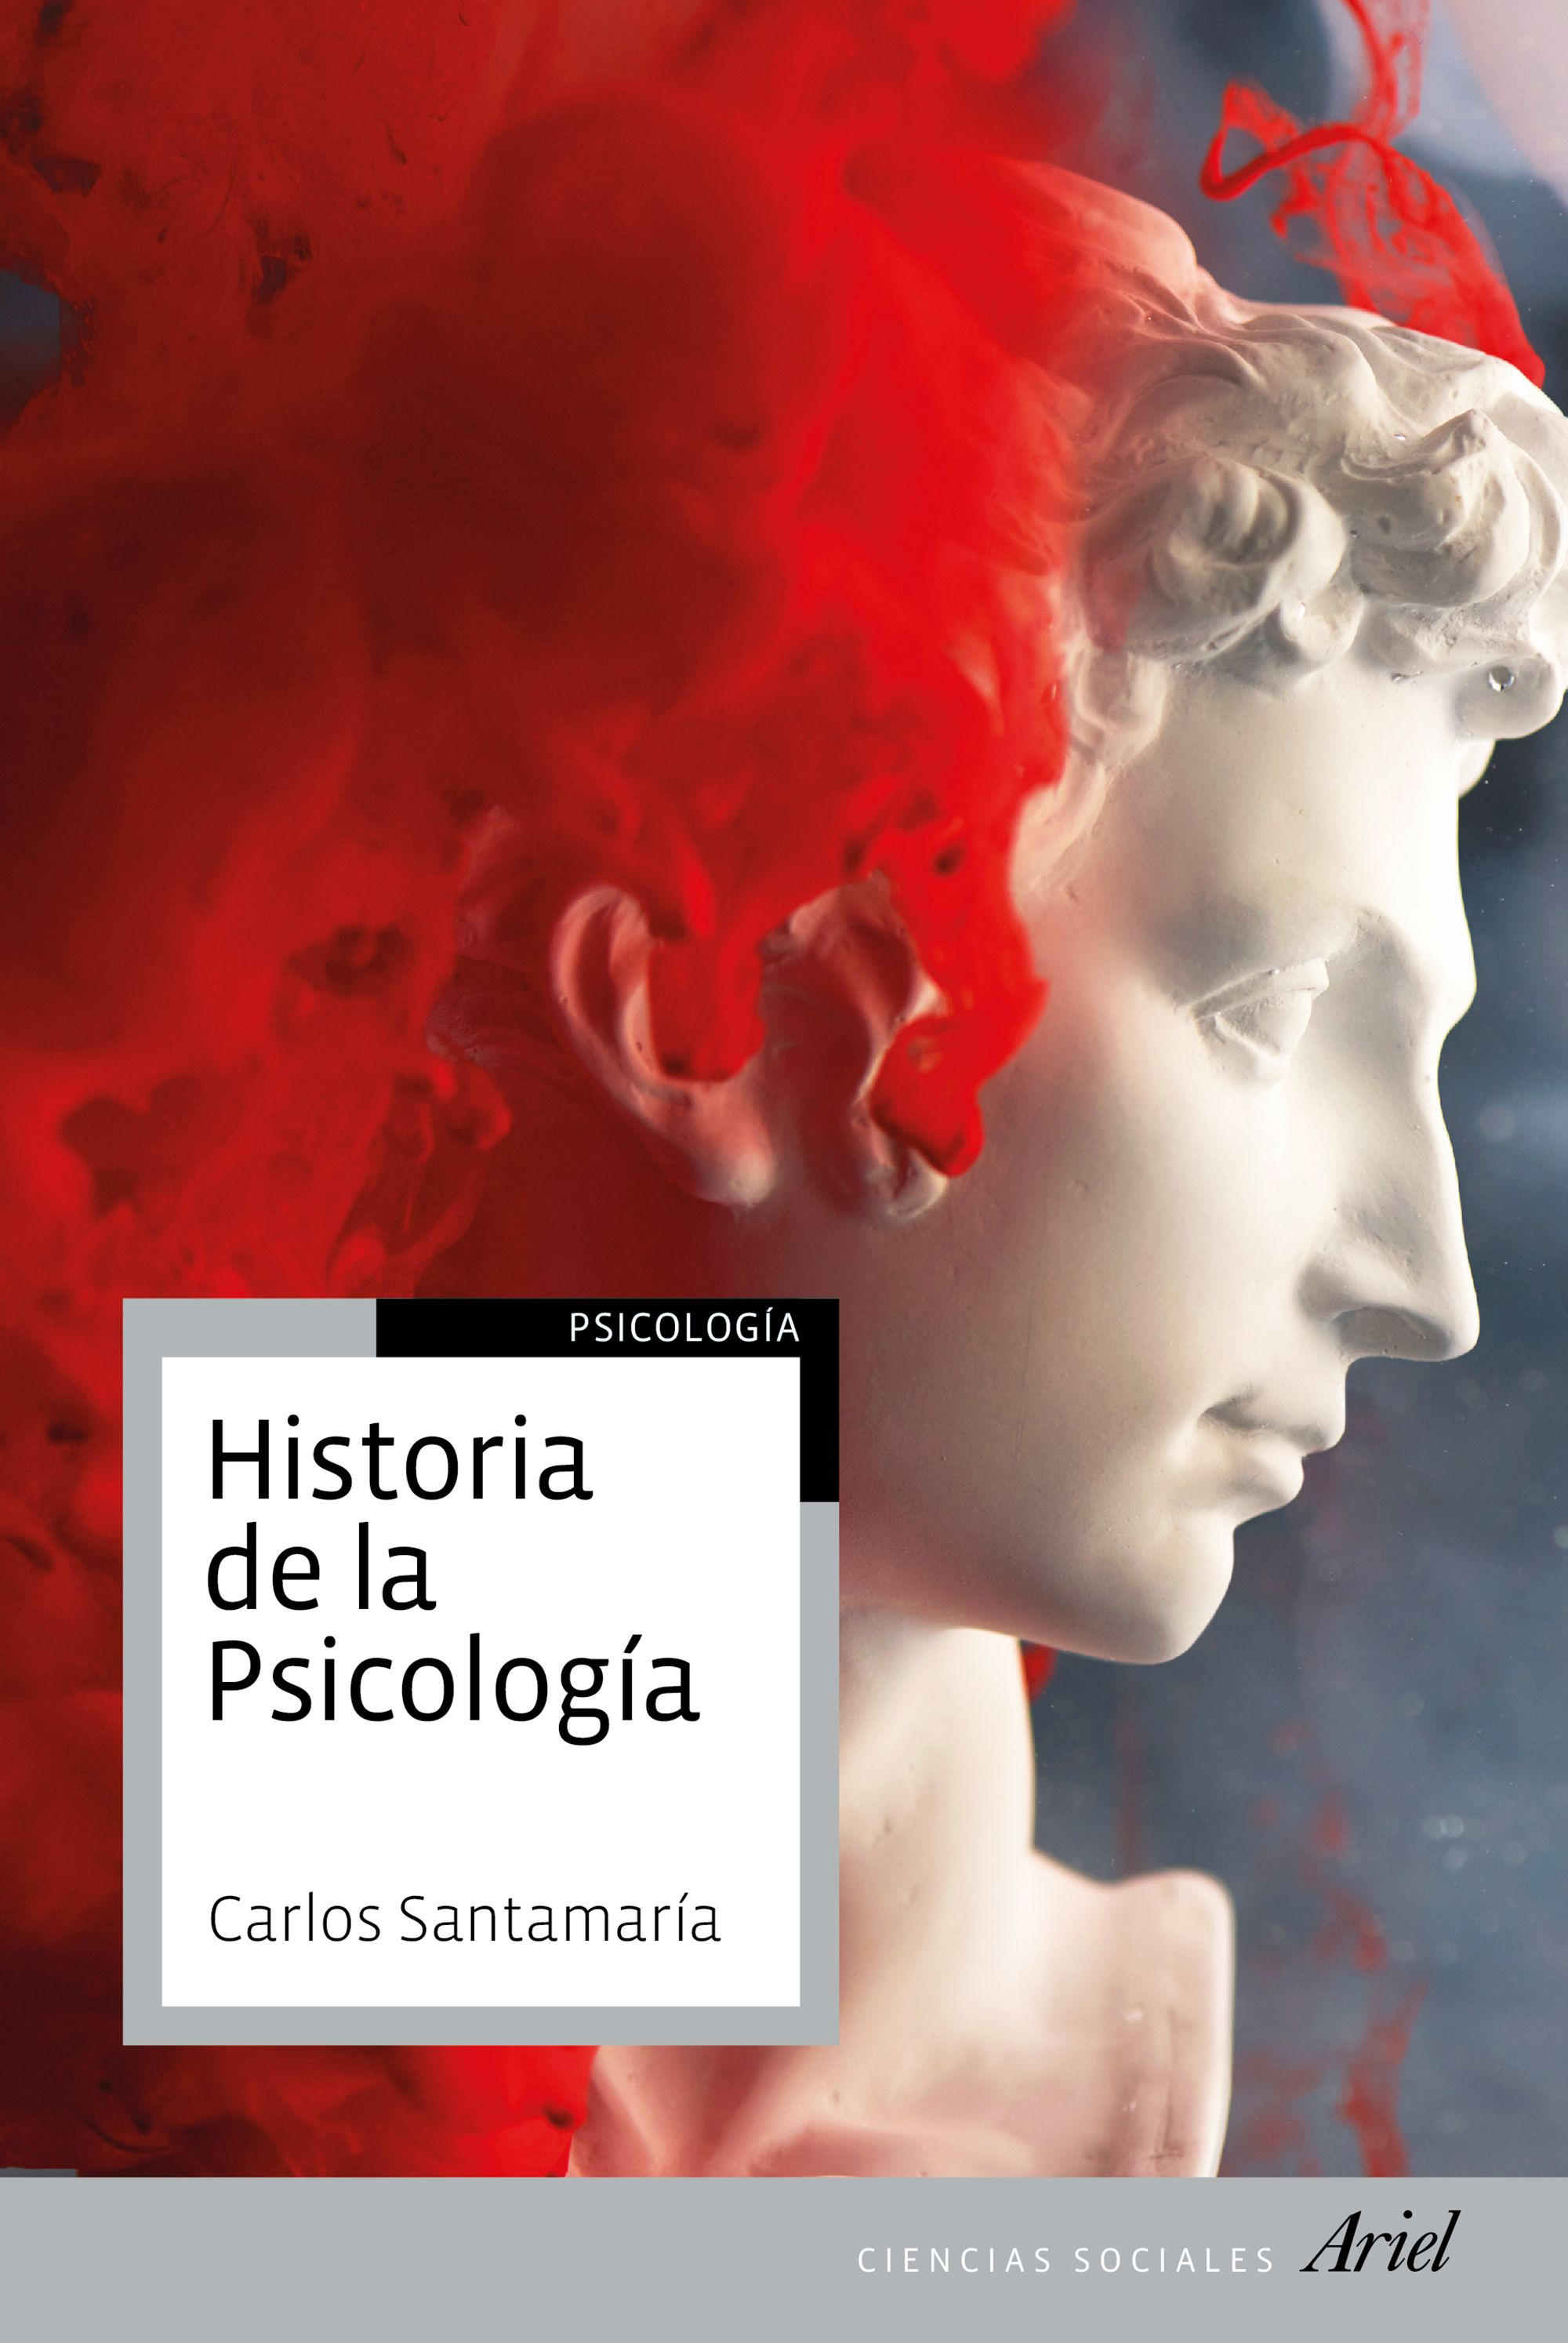 Historia de la psicología (Tapa blanda)